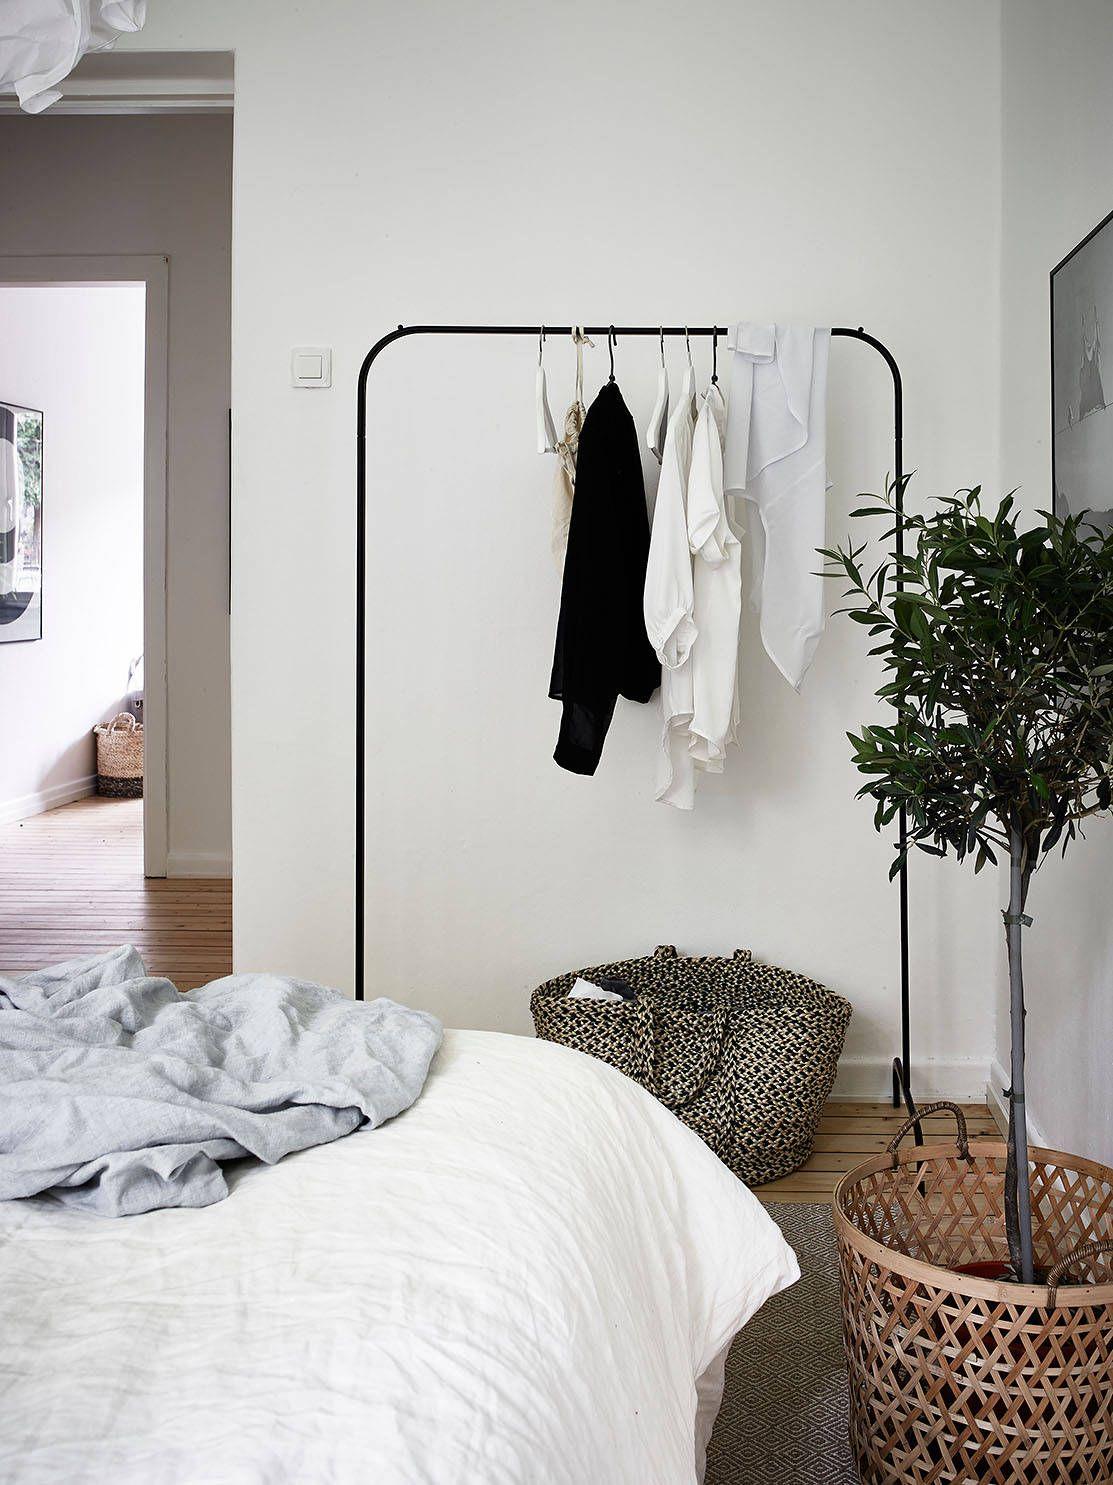 Pin by rachel assaf on lets get organized pinterest bedrooms